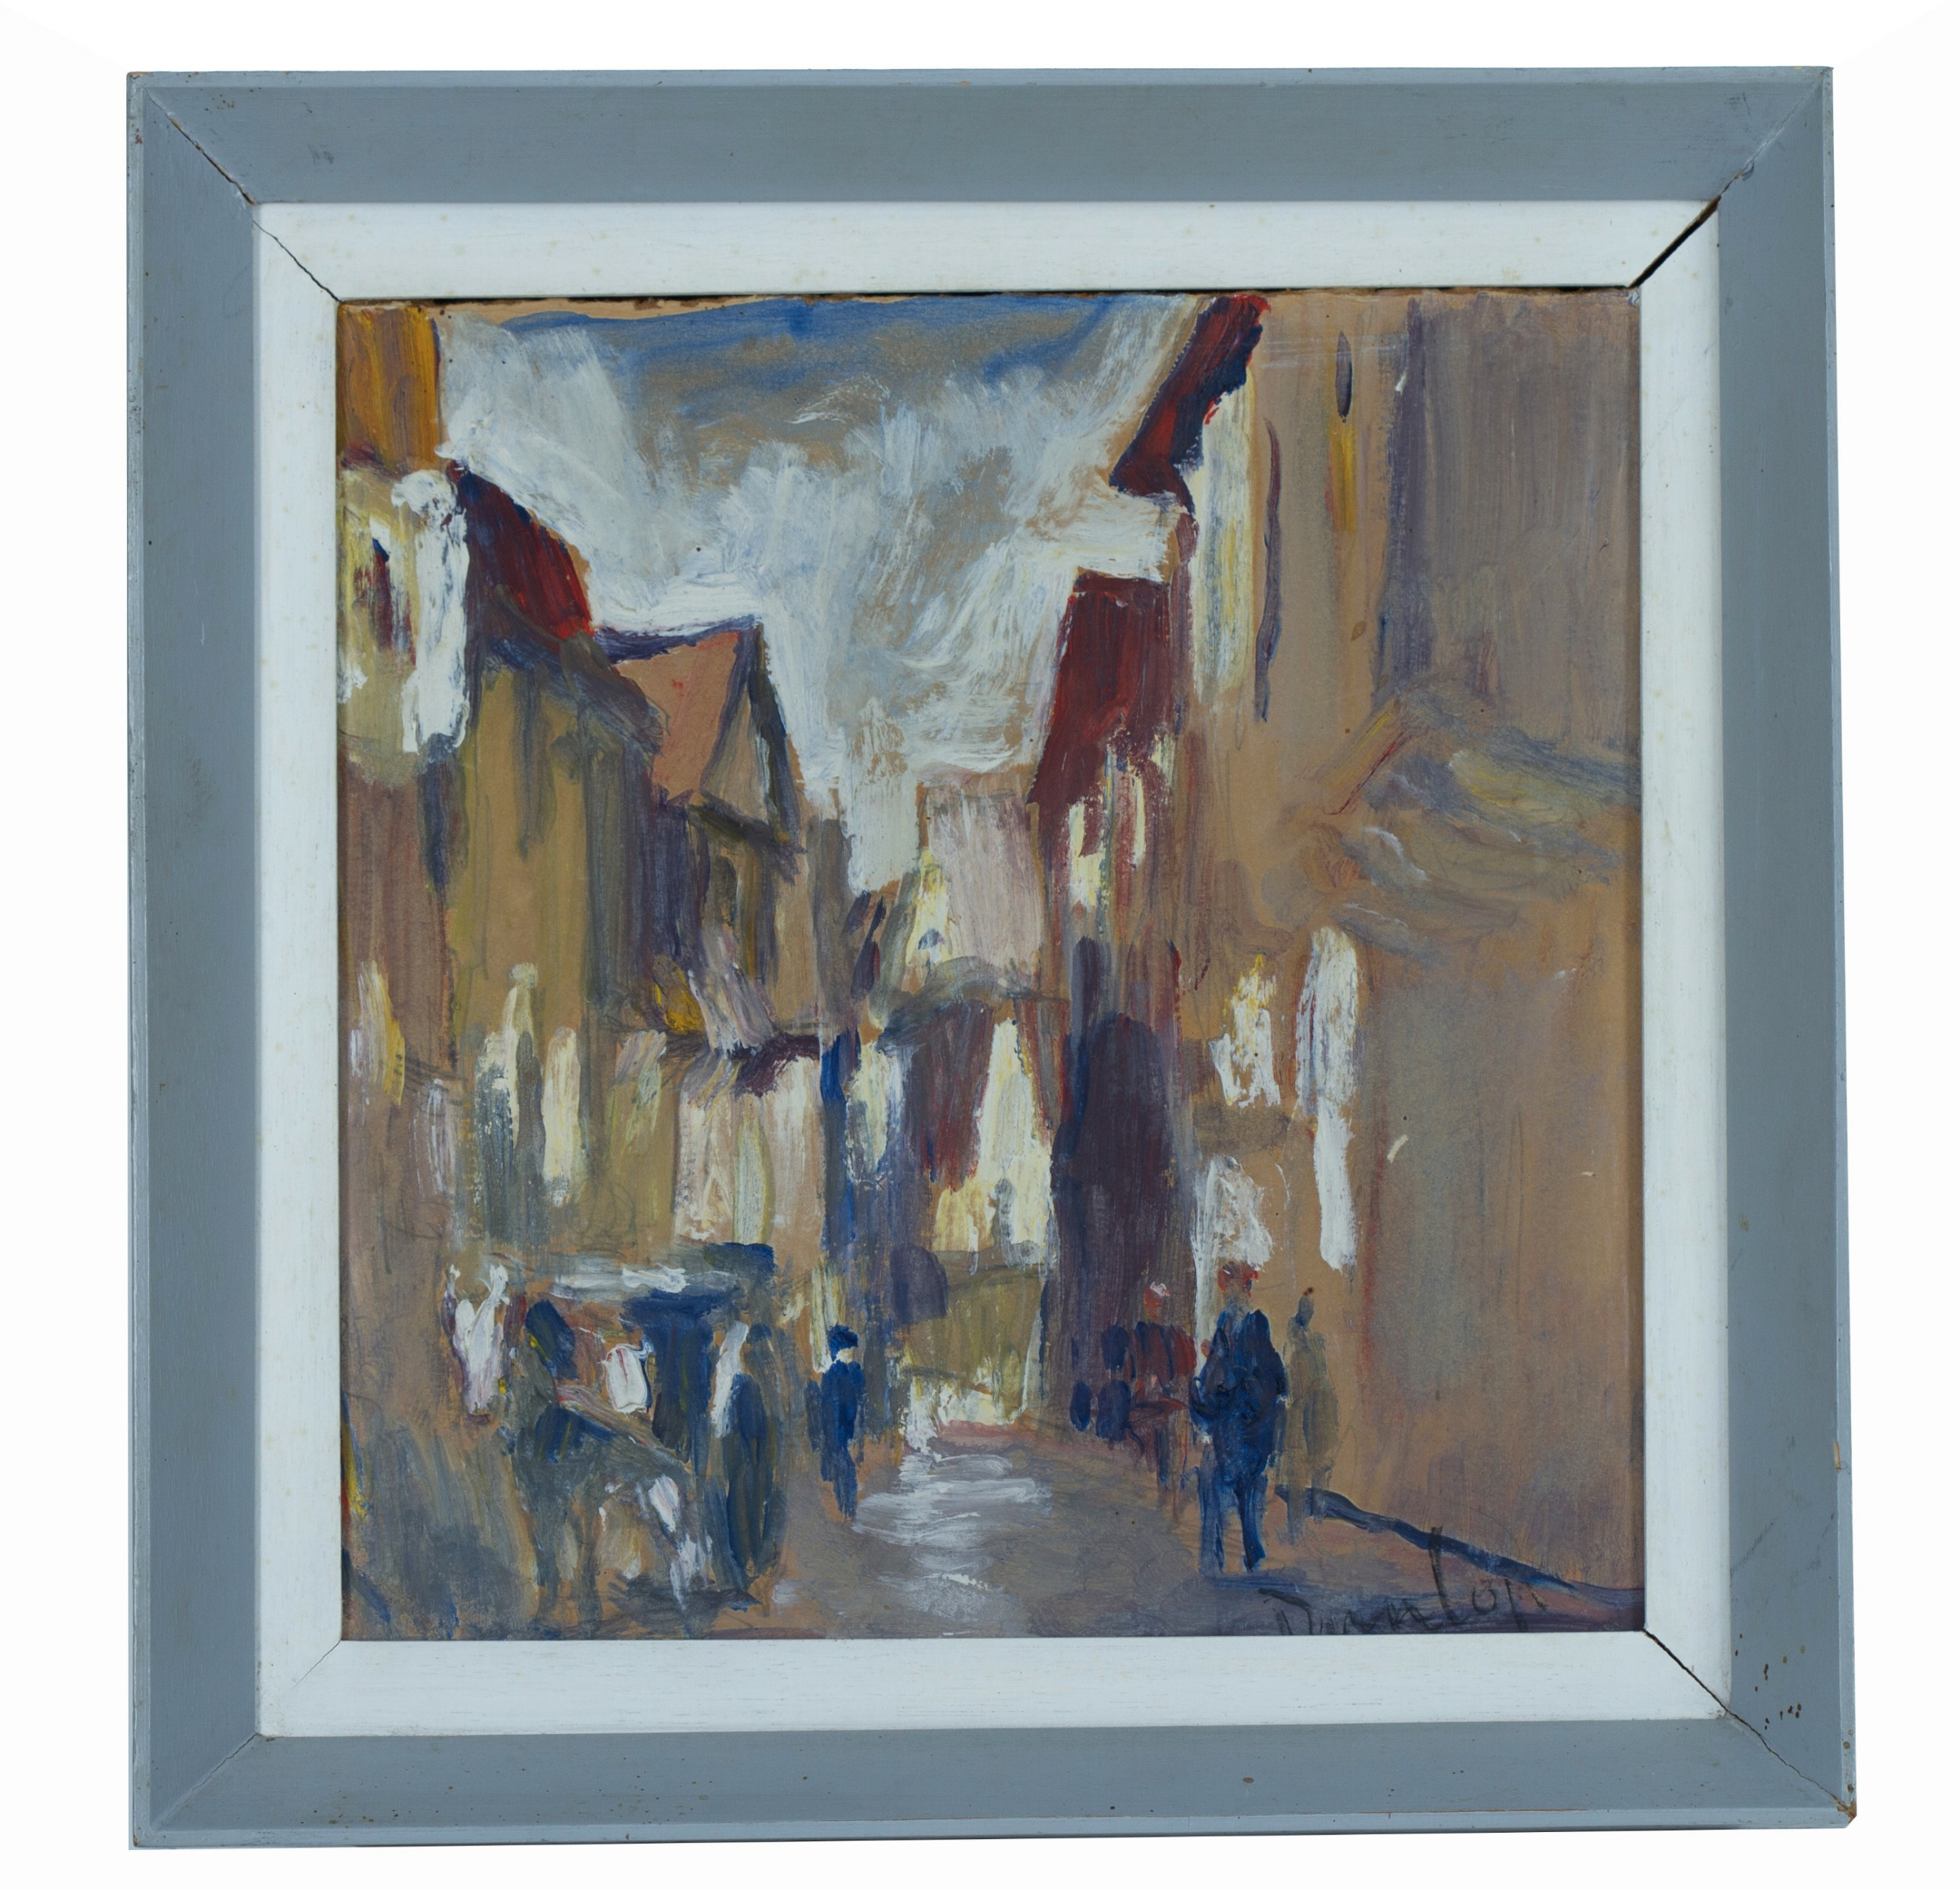 street sceneronald ossory dunlop irish 18941973 oil on board sold